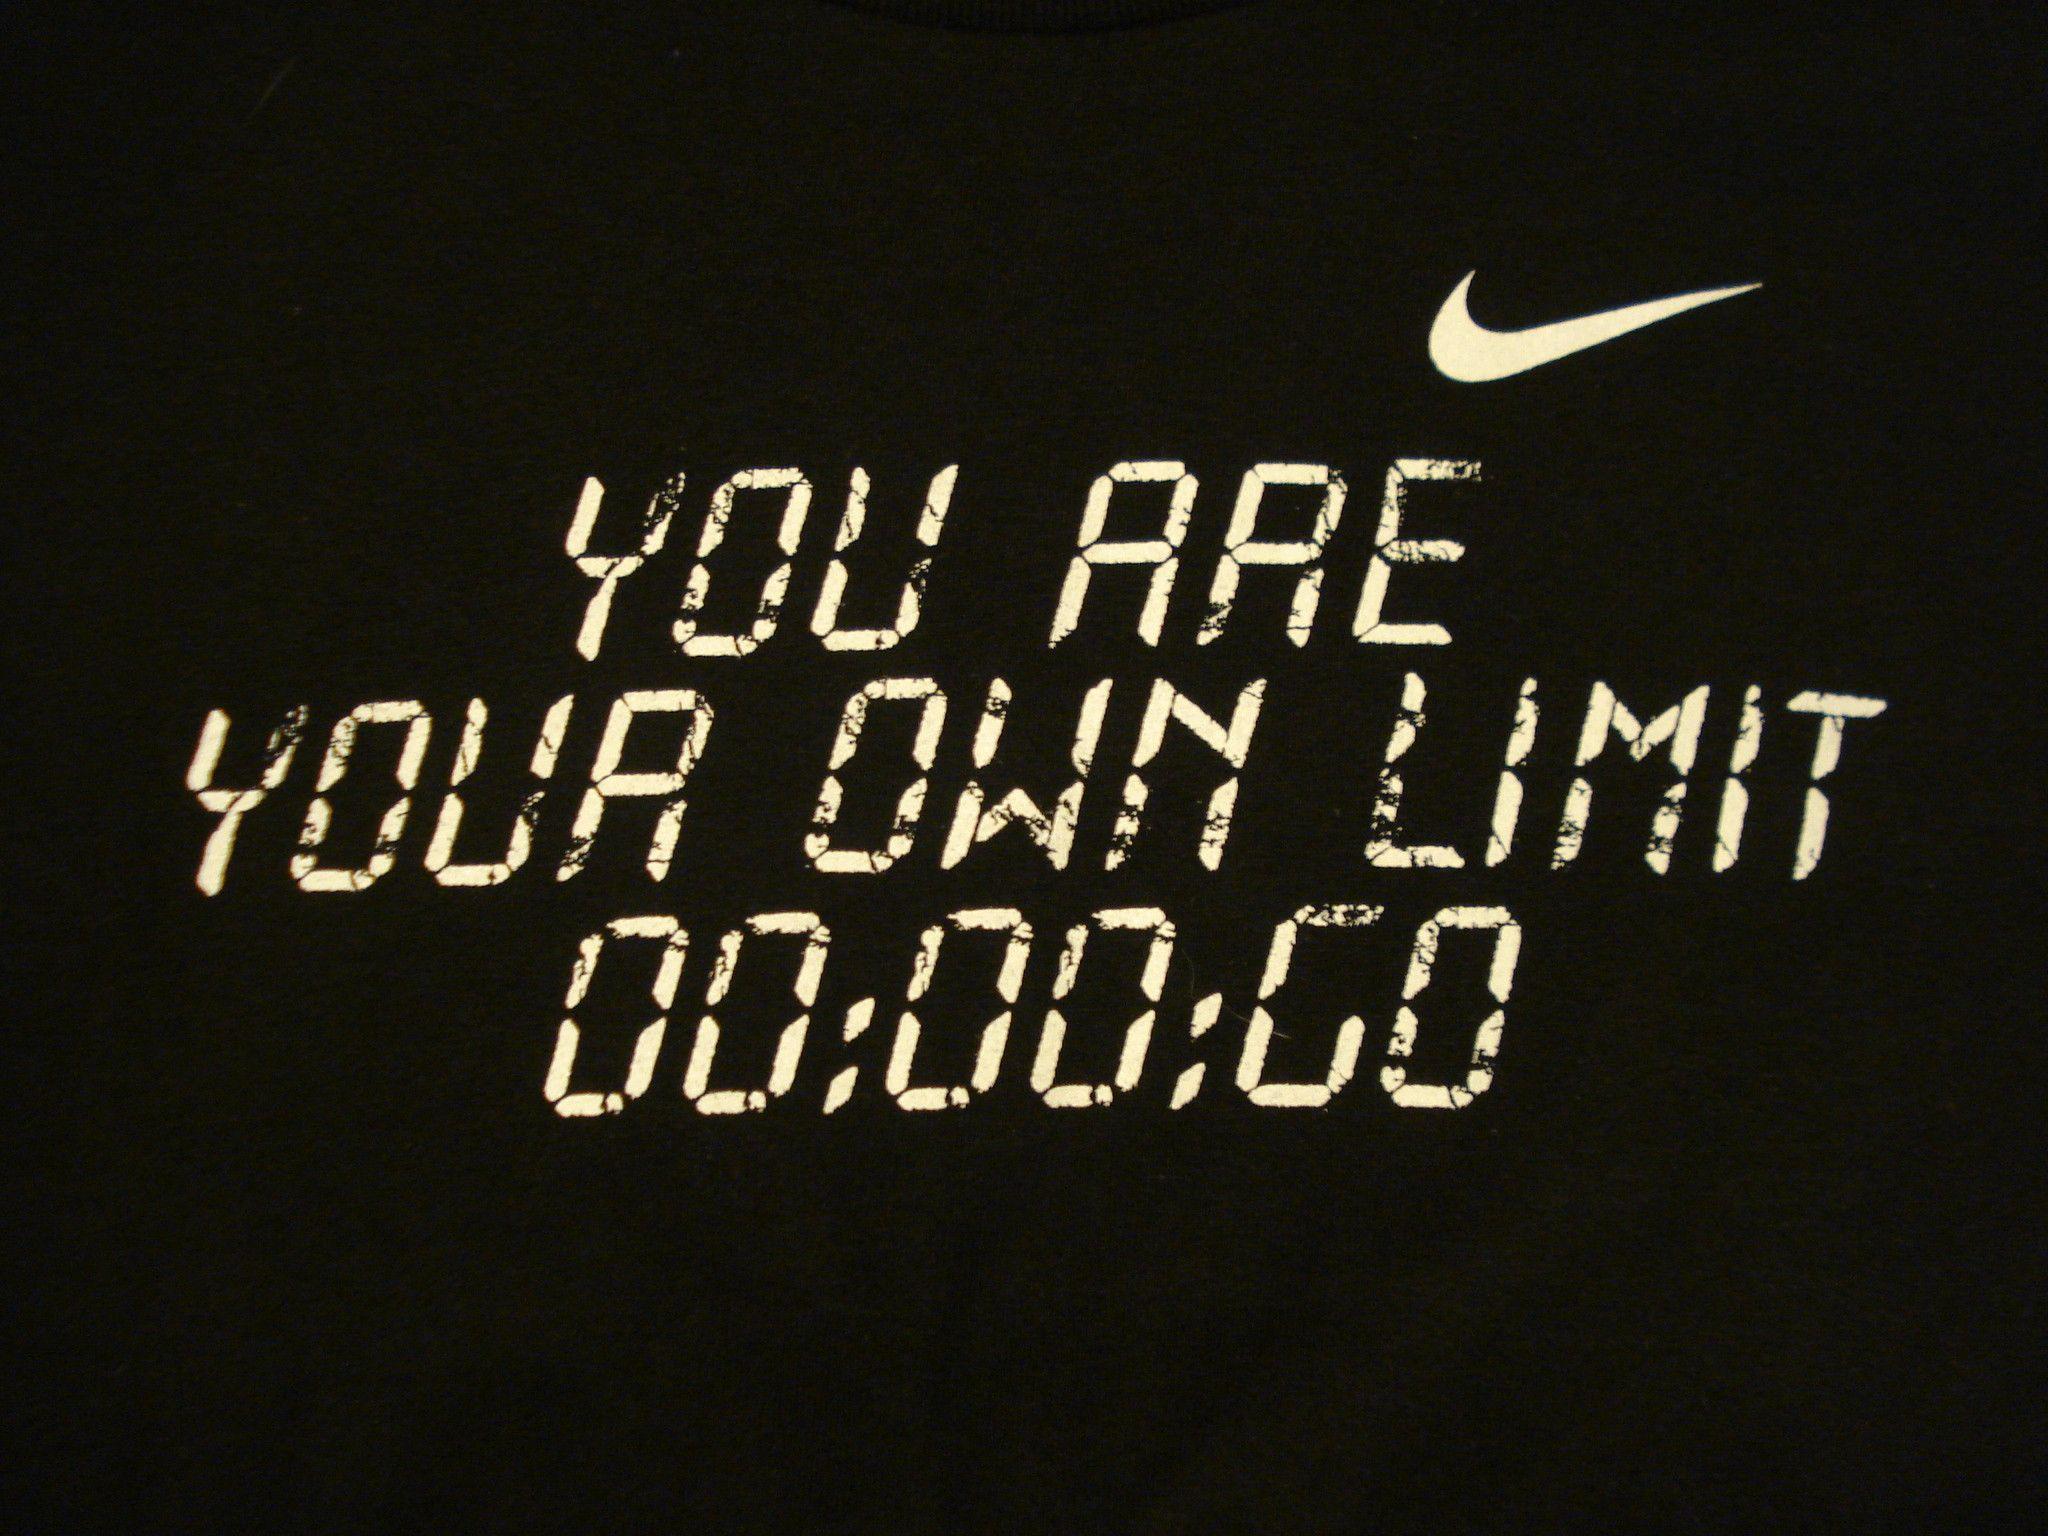 Nike Quotes Wallpaper Hd For Desktop Wallpaper 2048 - Motivational Wallpapers Nike - HD Wallpaper